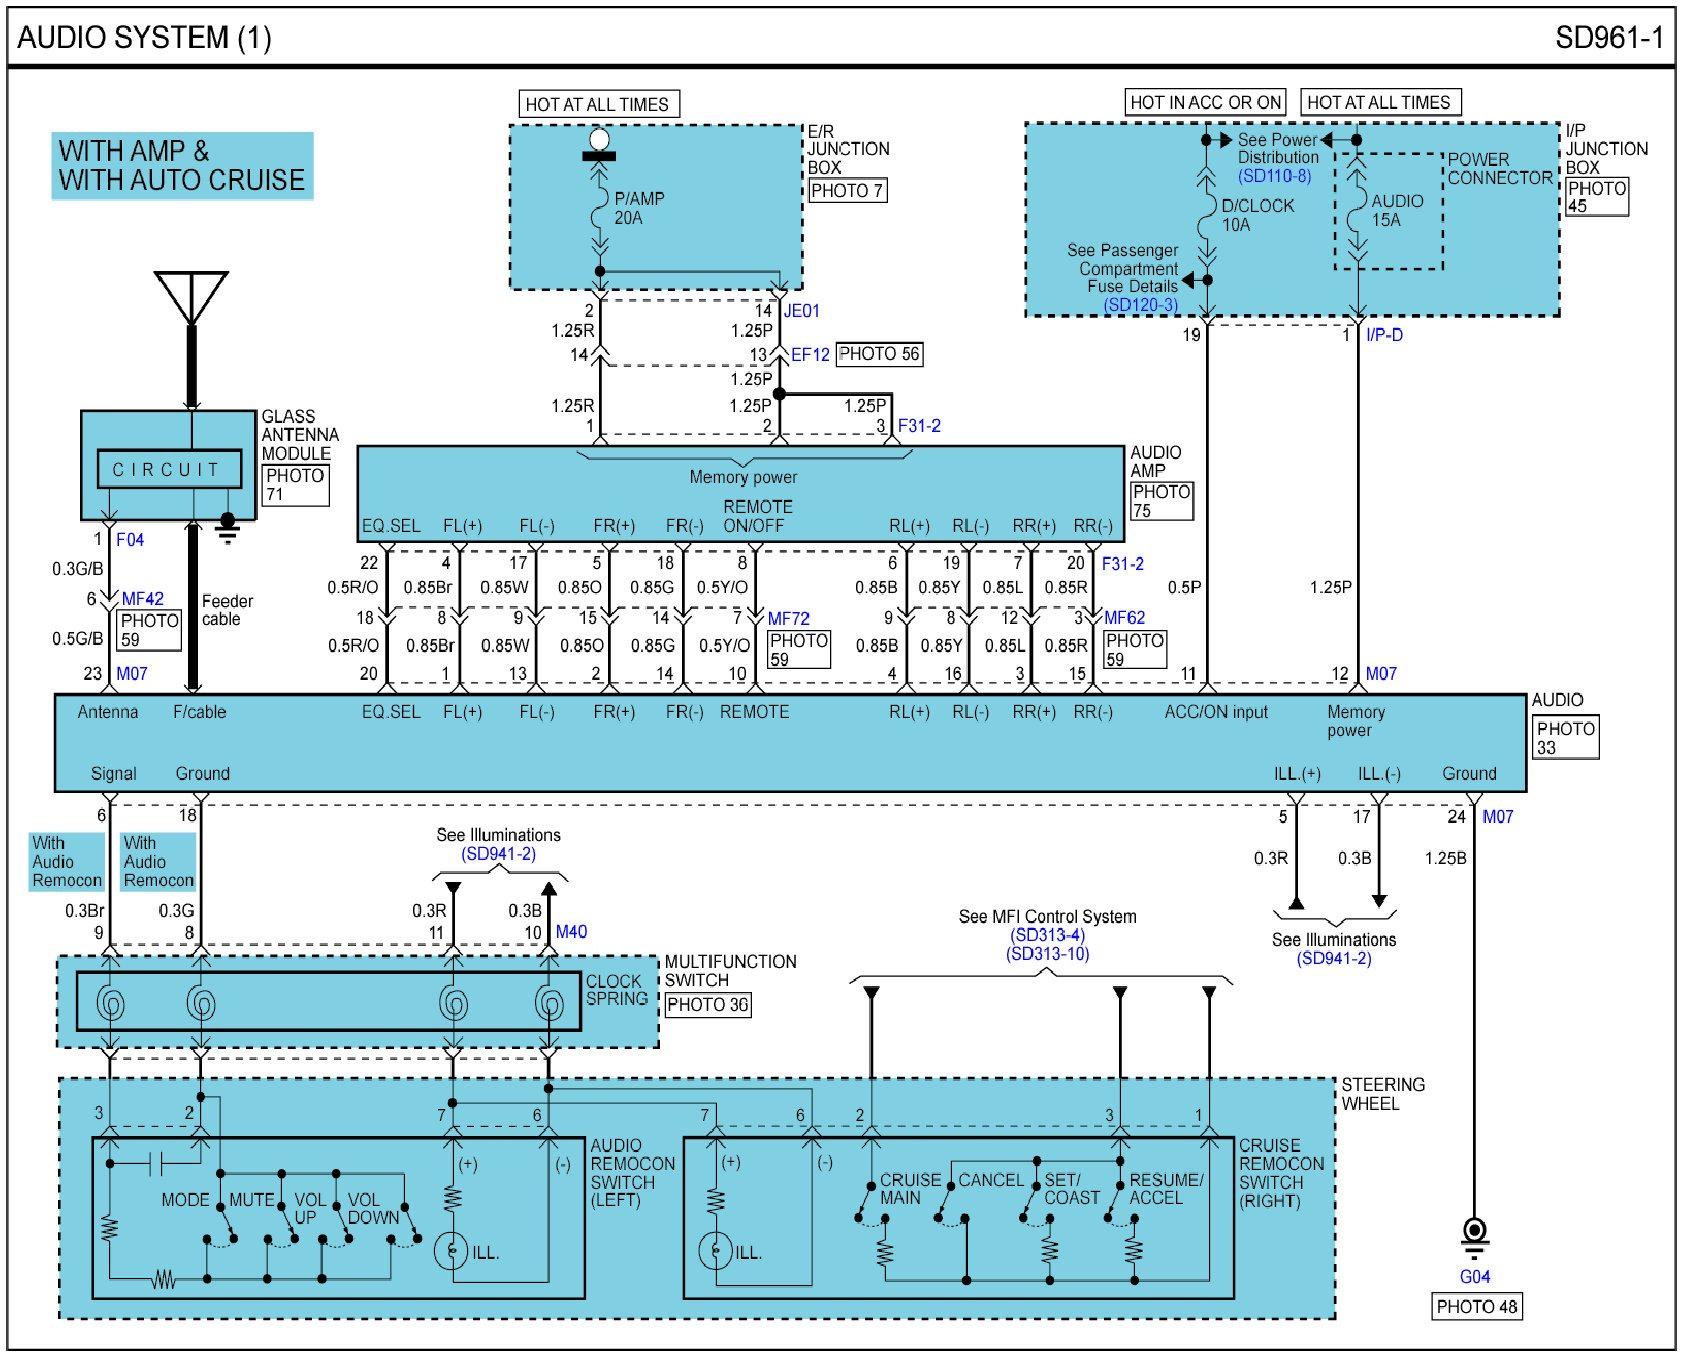 Groovy 2013 Kia Soul Wiring Diagram Radio General Wiring Diagram Data Wiring Cloud Hisonepsysticxongrecoveryedborg